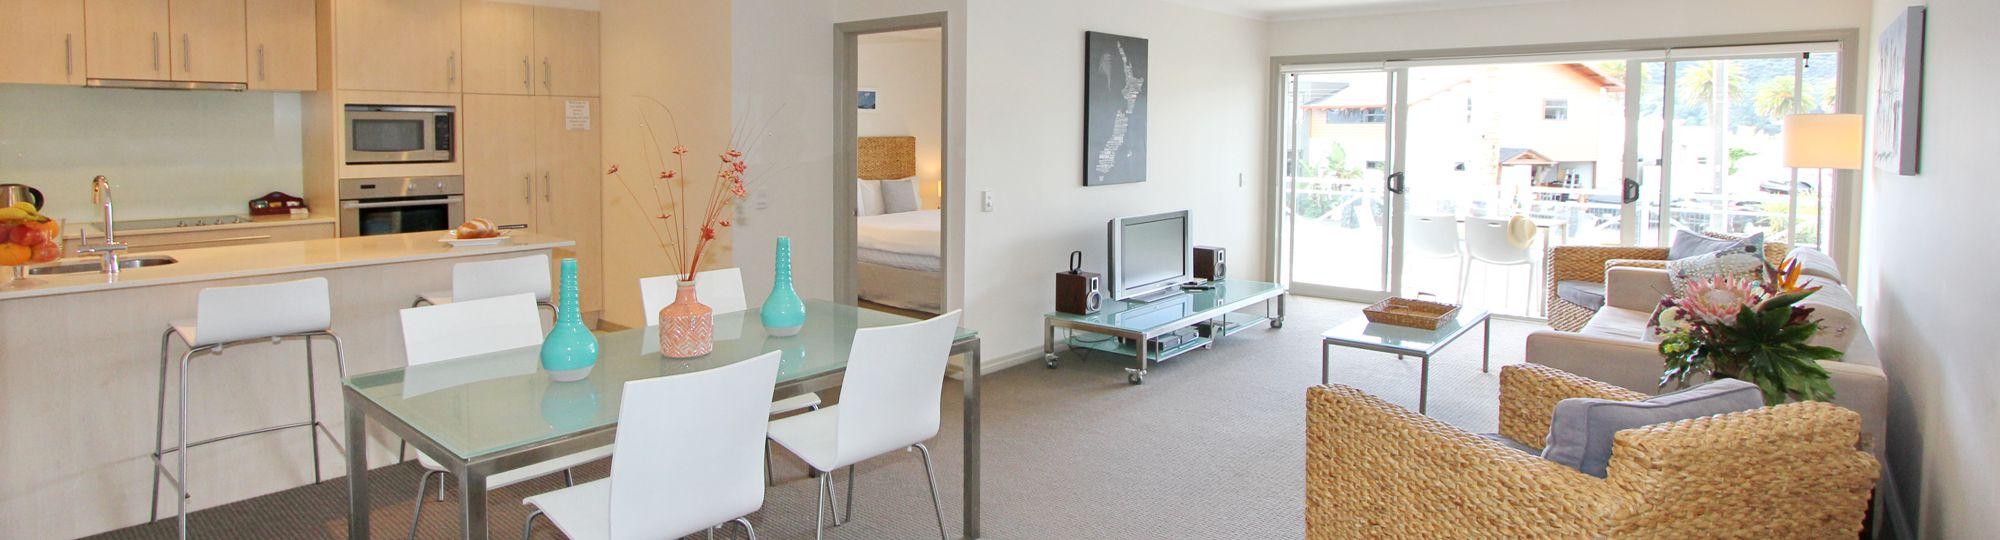 Spacious 2 bedroom Apartment Accommodation Whitianga